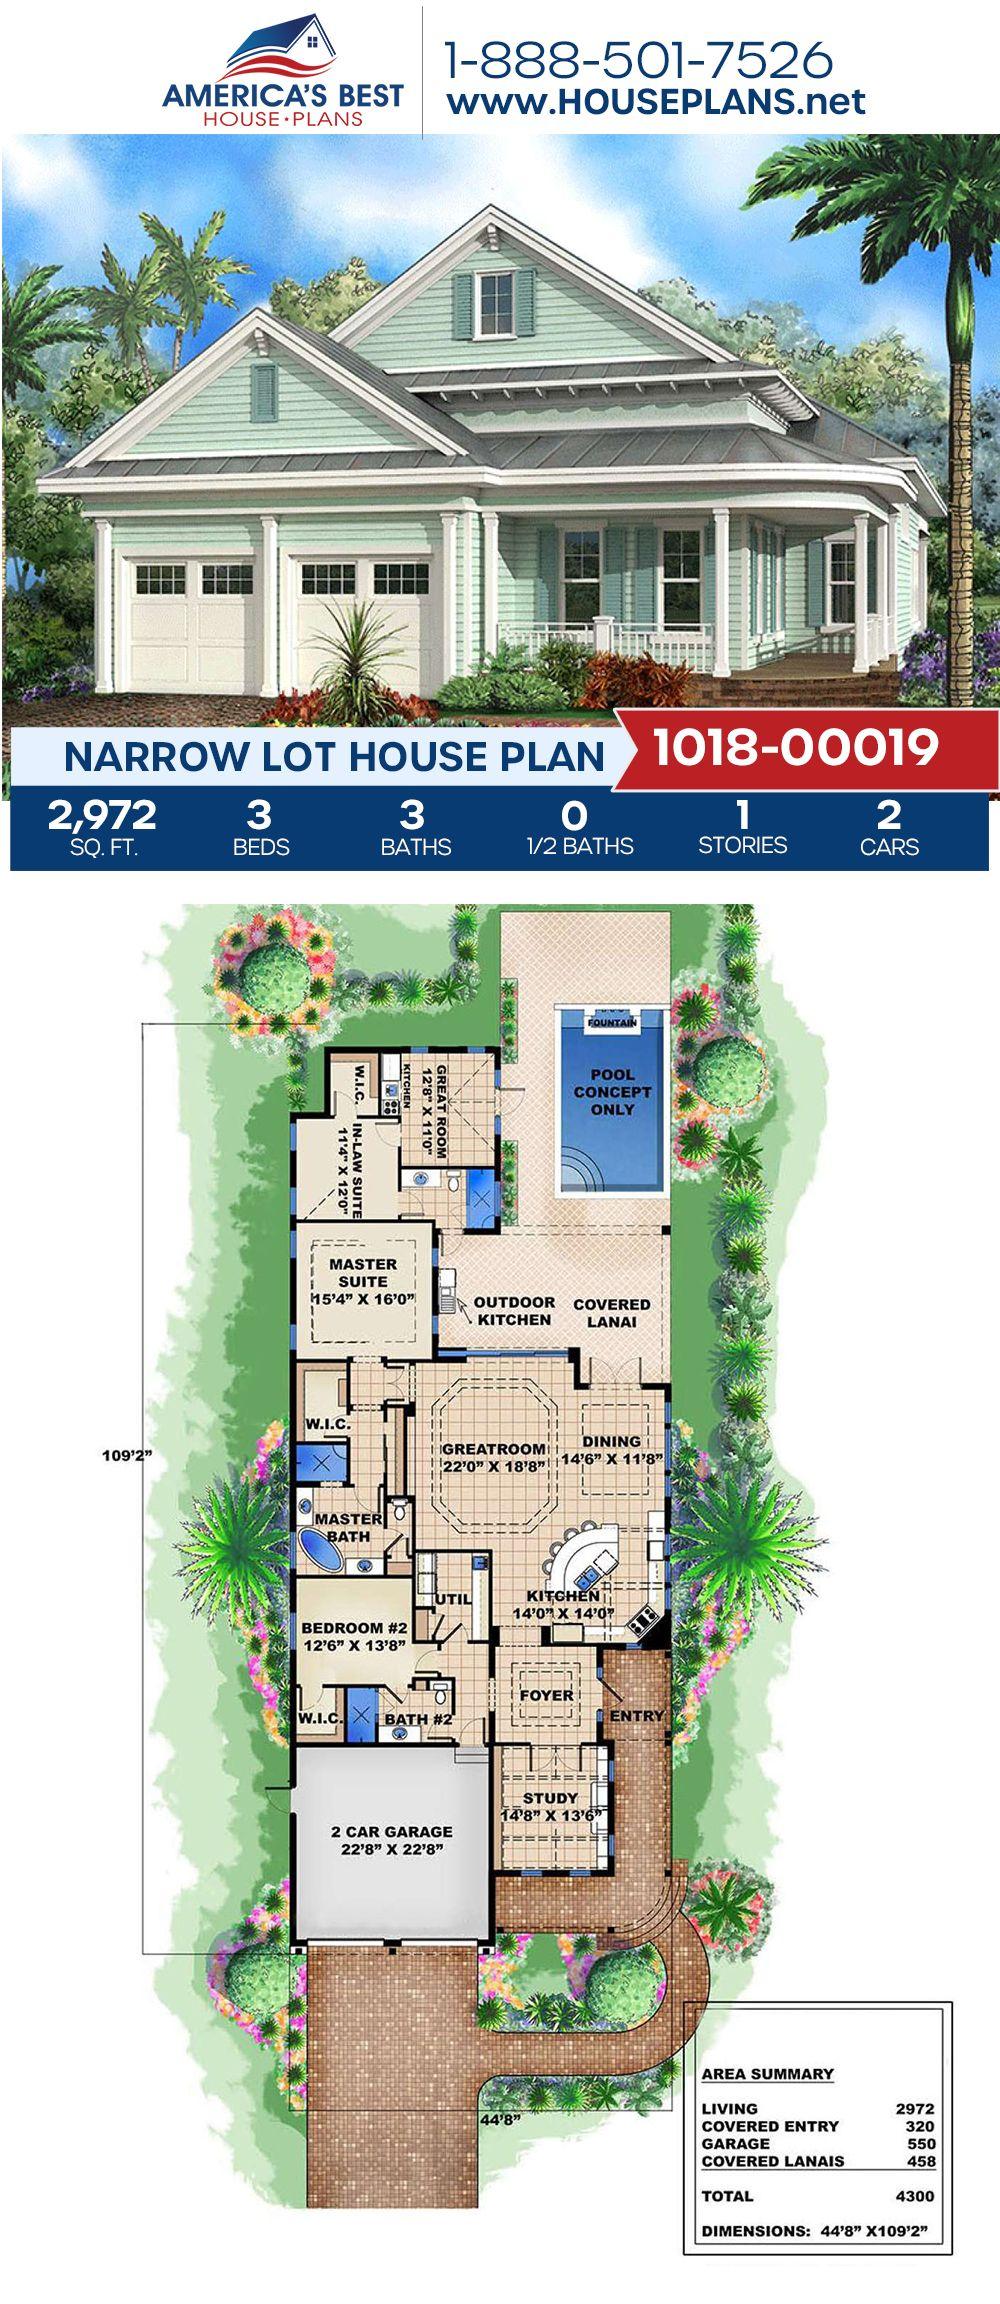 House Plan 1018 00019 Narrow Lot Plan 2 972 Square Feet 3 Bedrooms 3 Bathrooms In 2020 Narrow Lot House Plans Narrow Lot House Beach House Plans